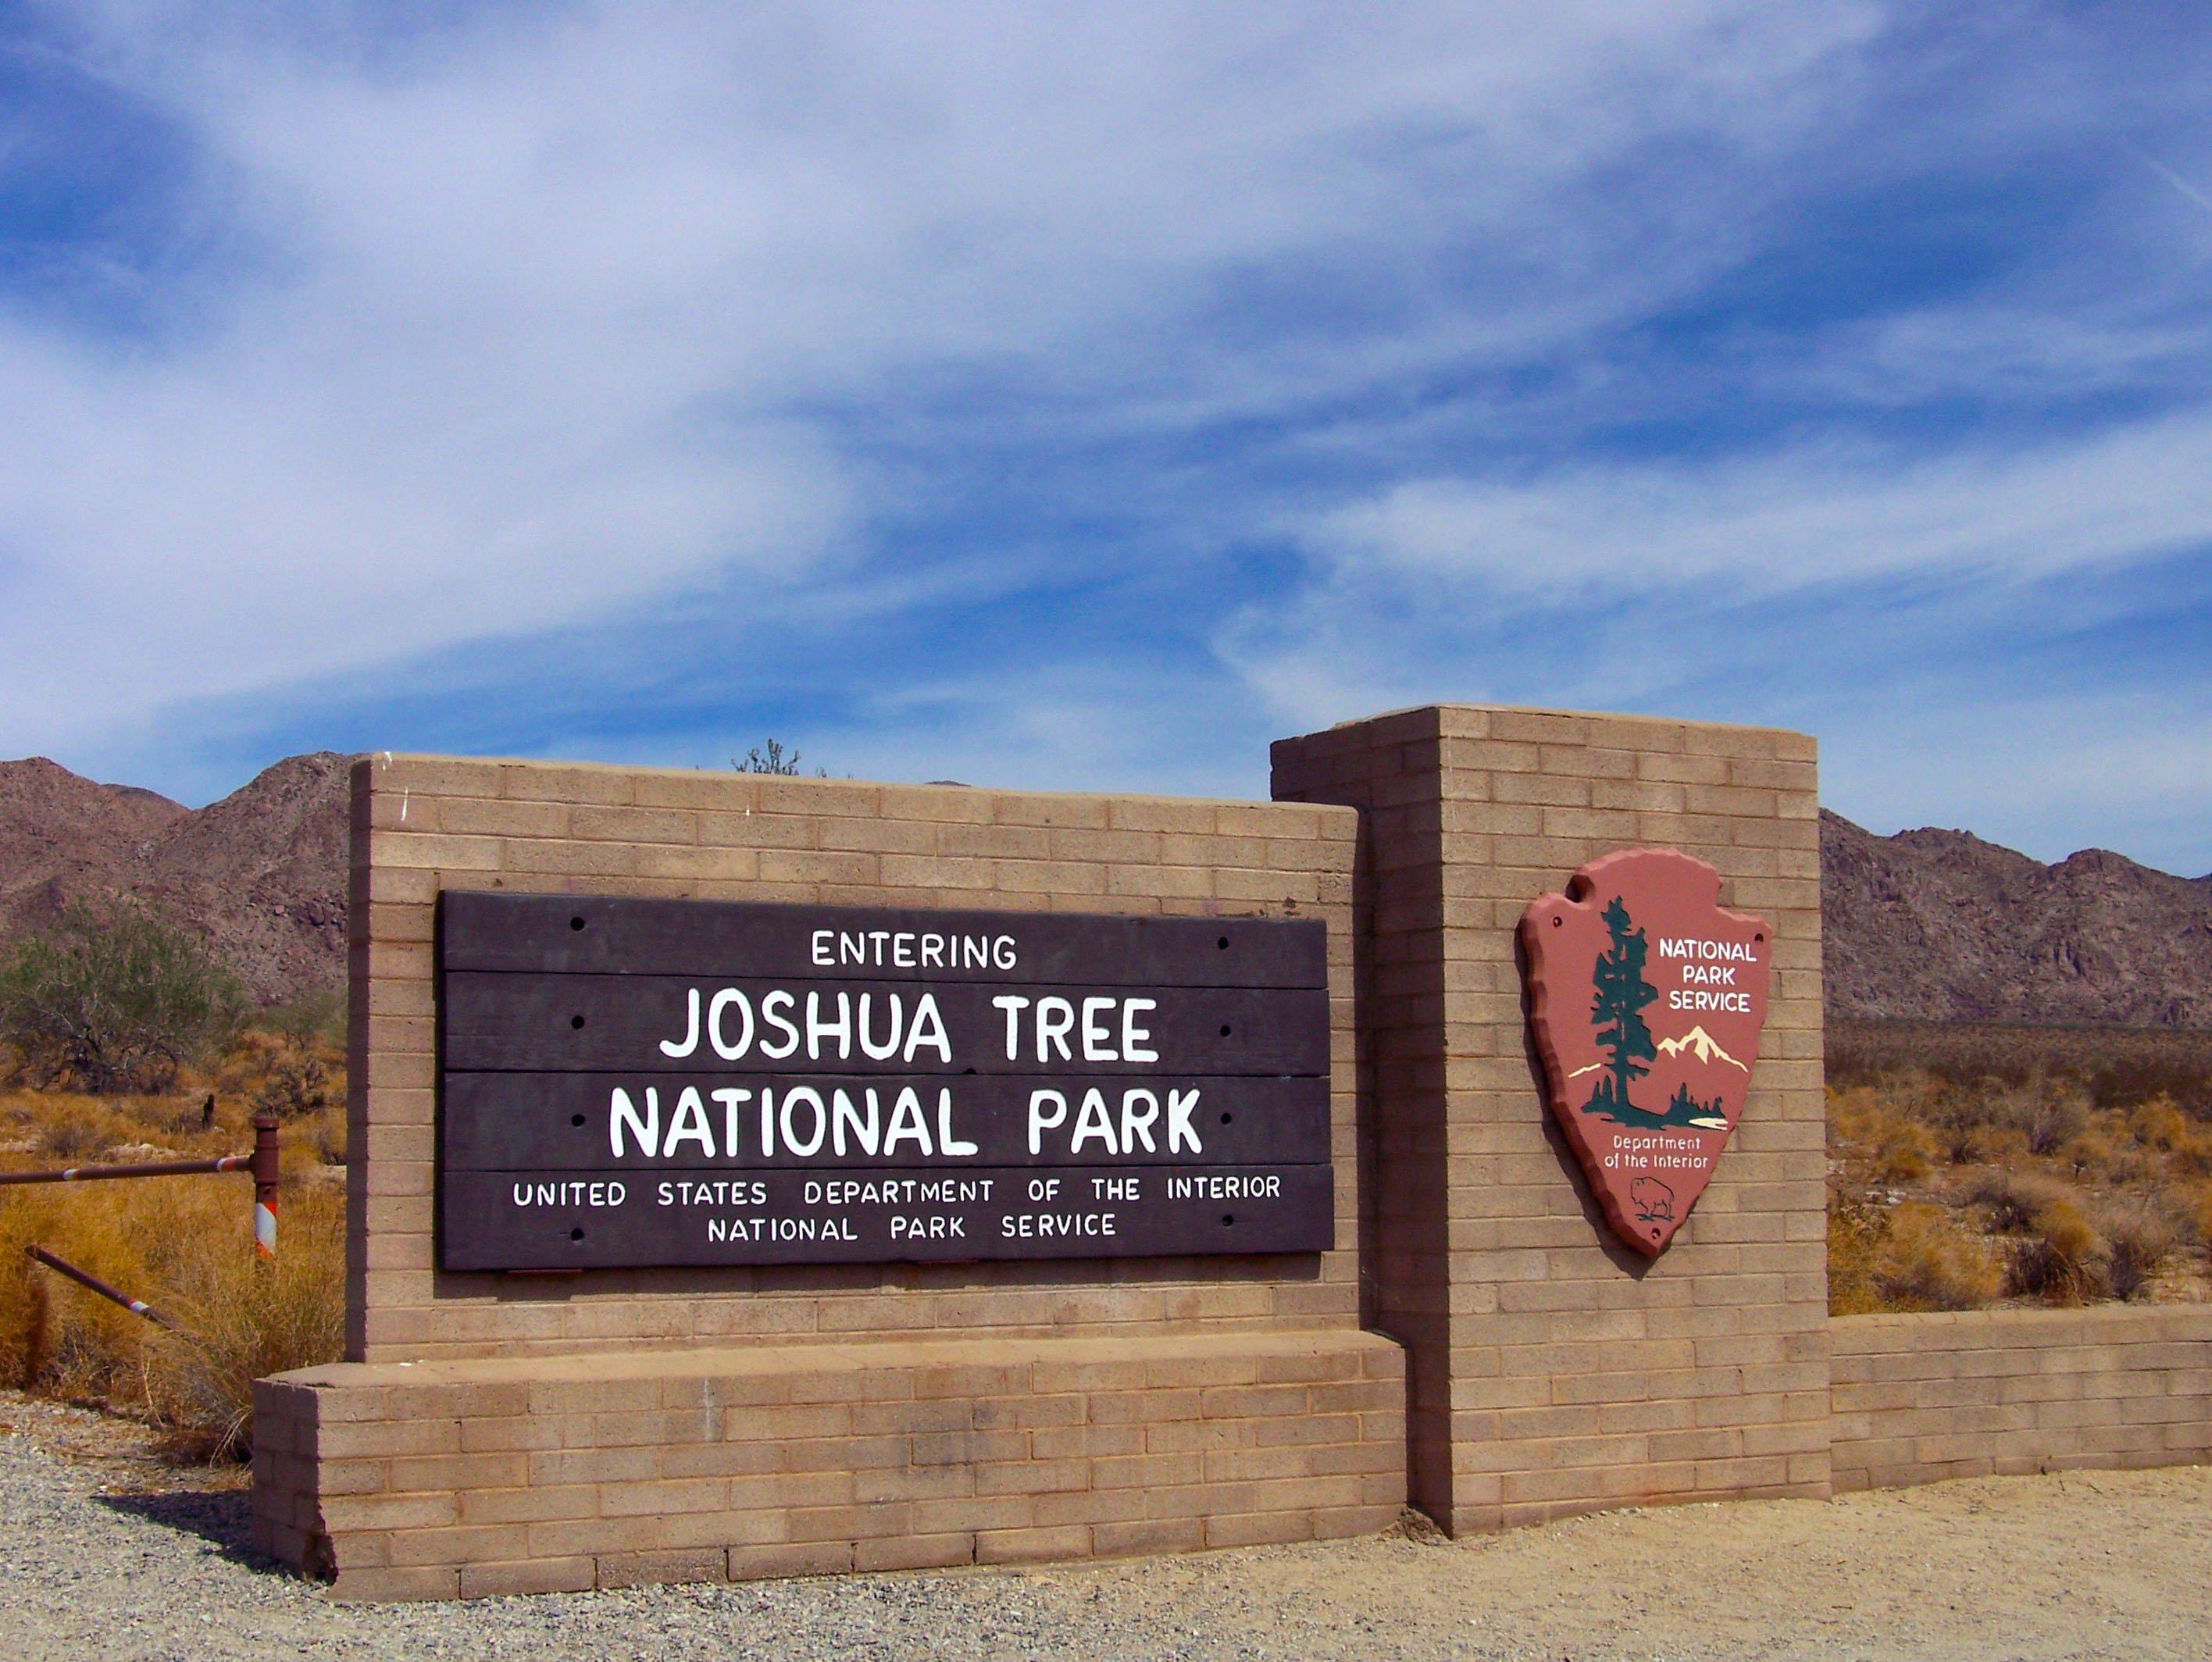 Los Angeles To Joshua Tree National Park Tour